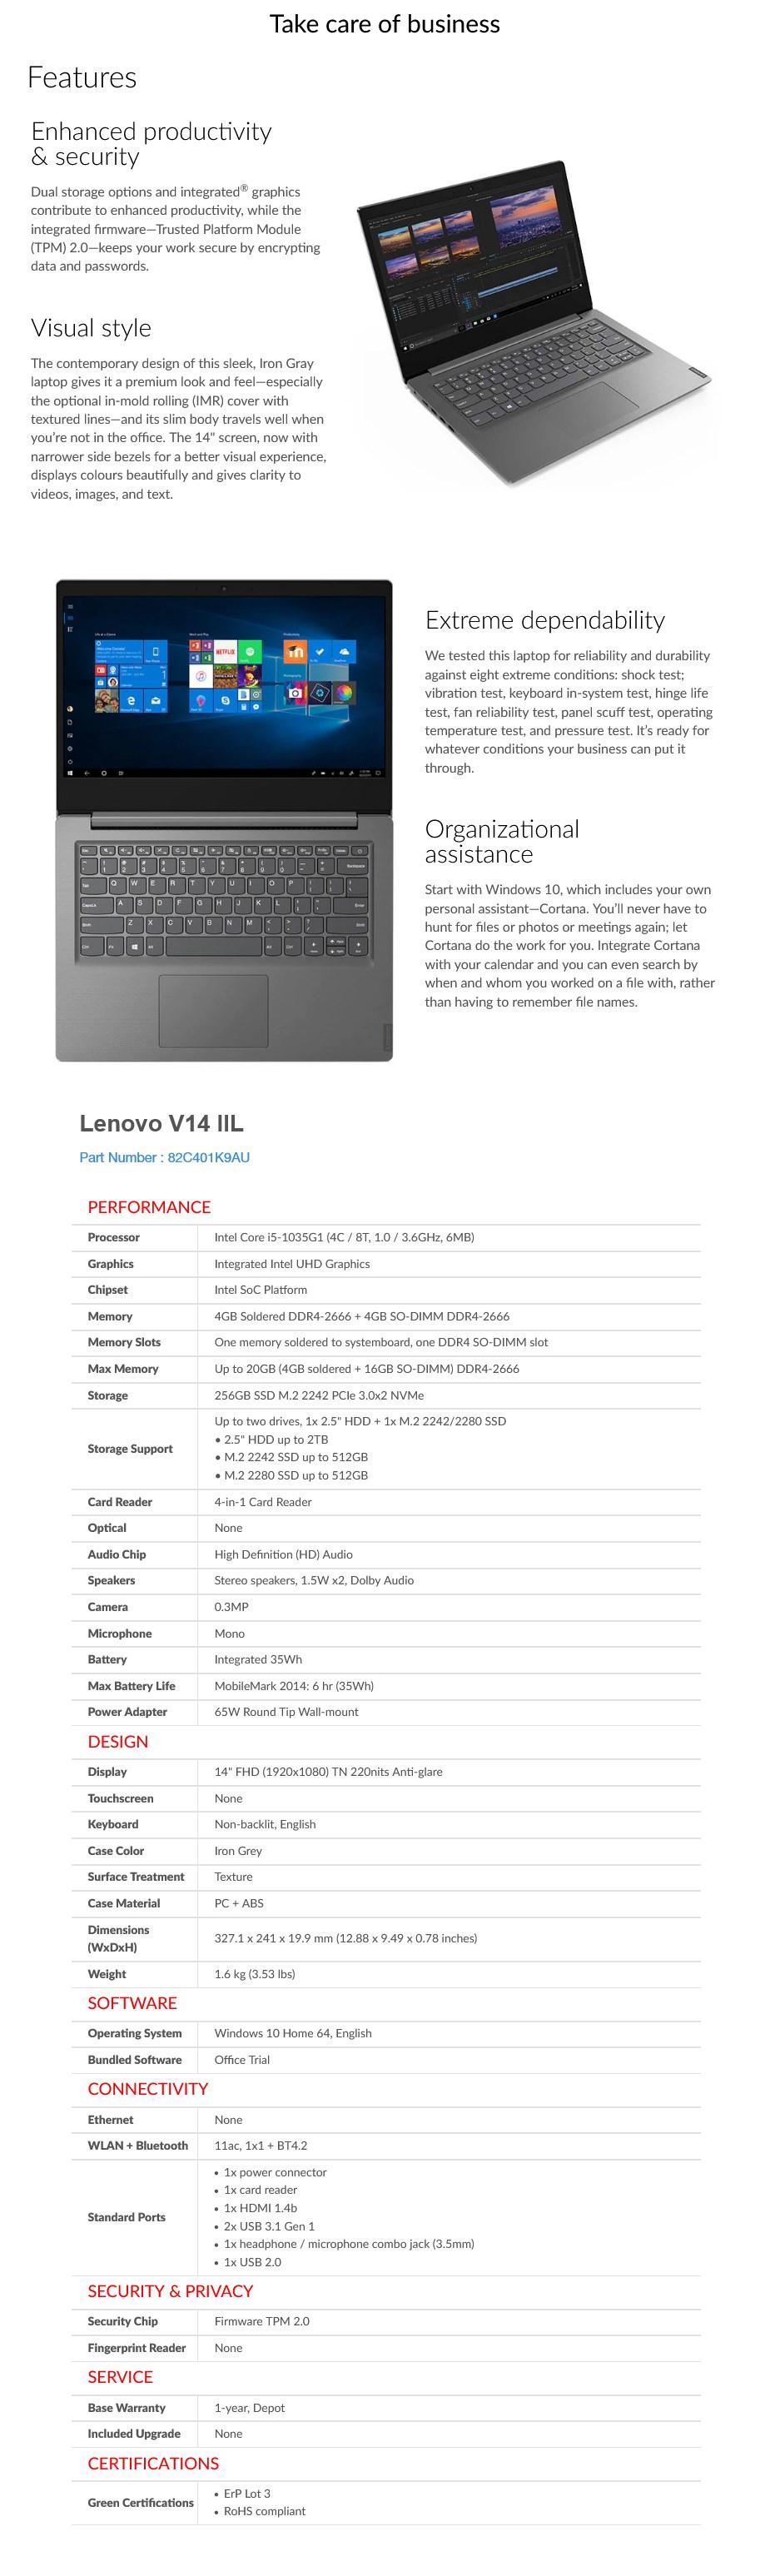 lenovo-v14iil-14-fhd-laptop-i51035g1-8gb-256gb-win10-home-ac44786-9.jpg